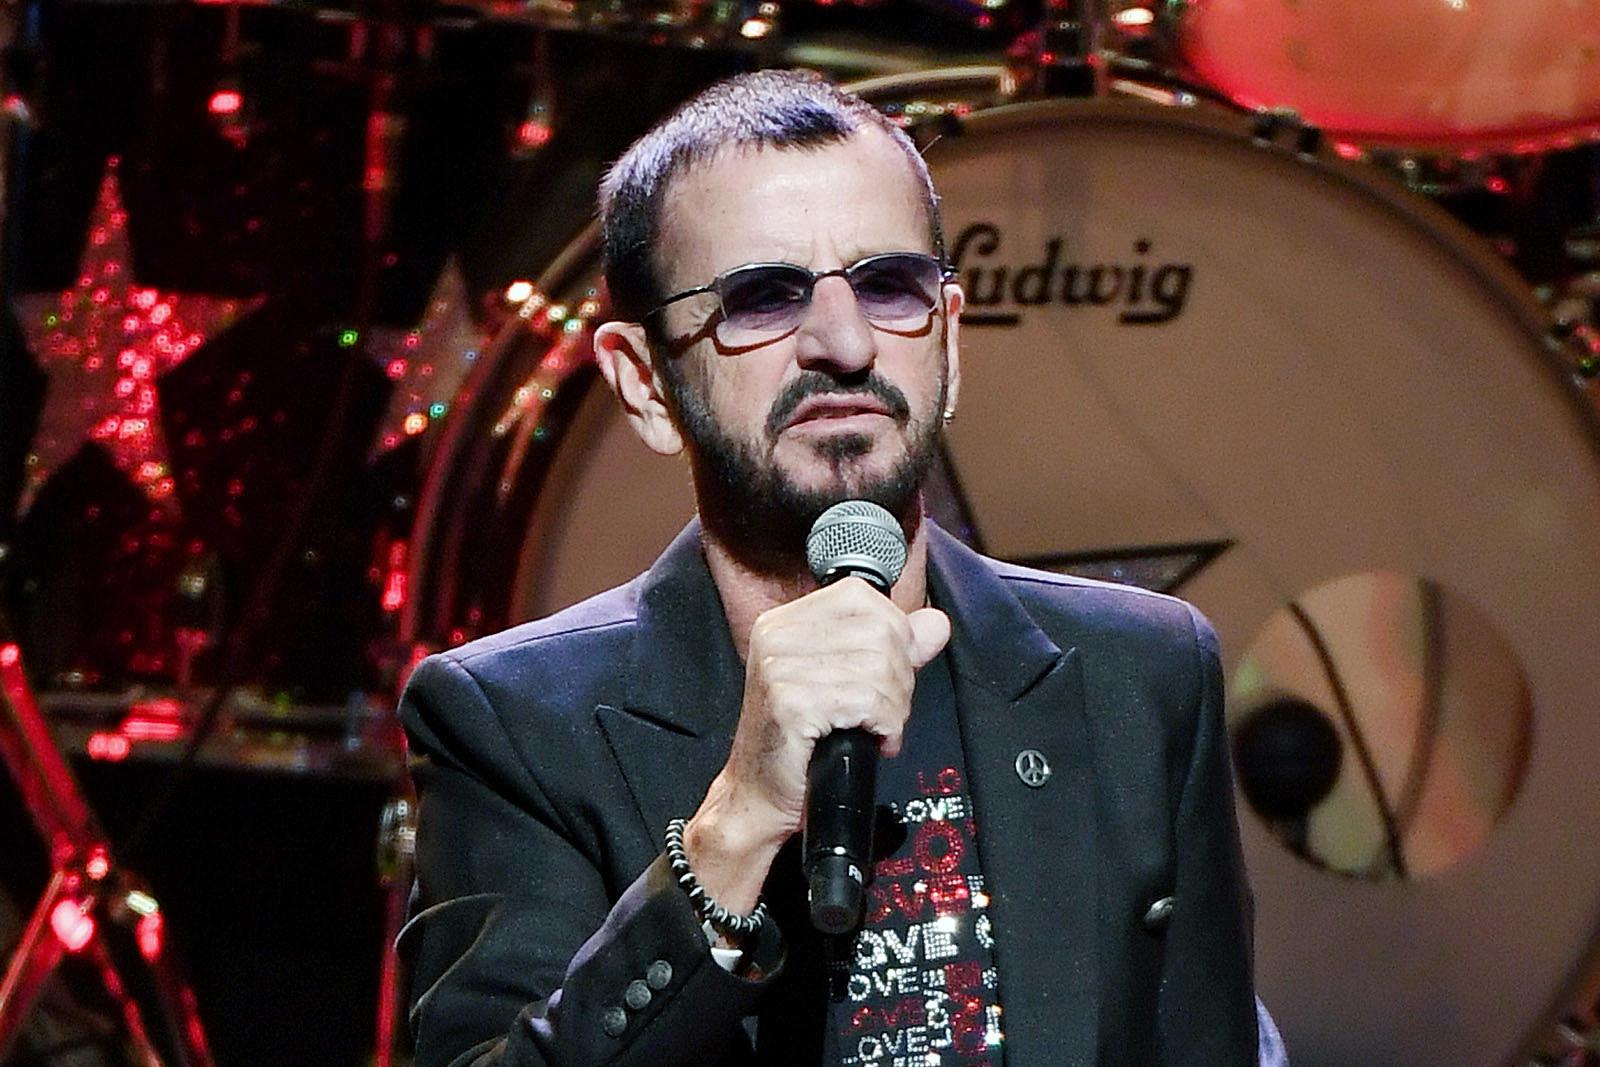 Ringo Starr Announces First 2019 Tour Dates, New Book